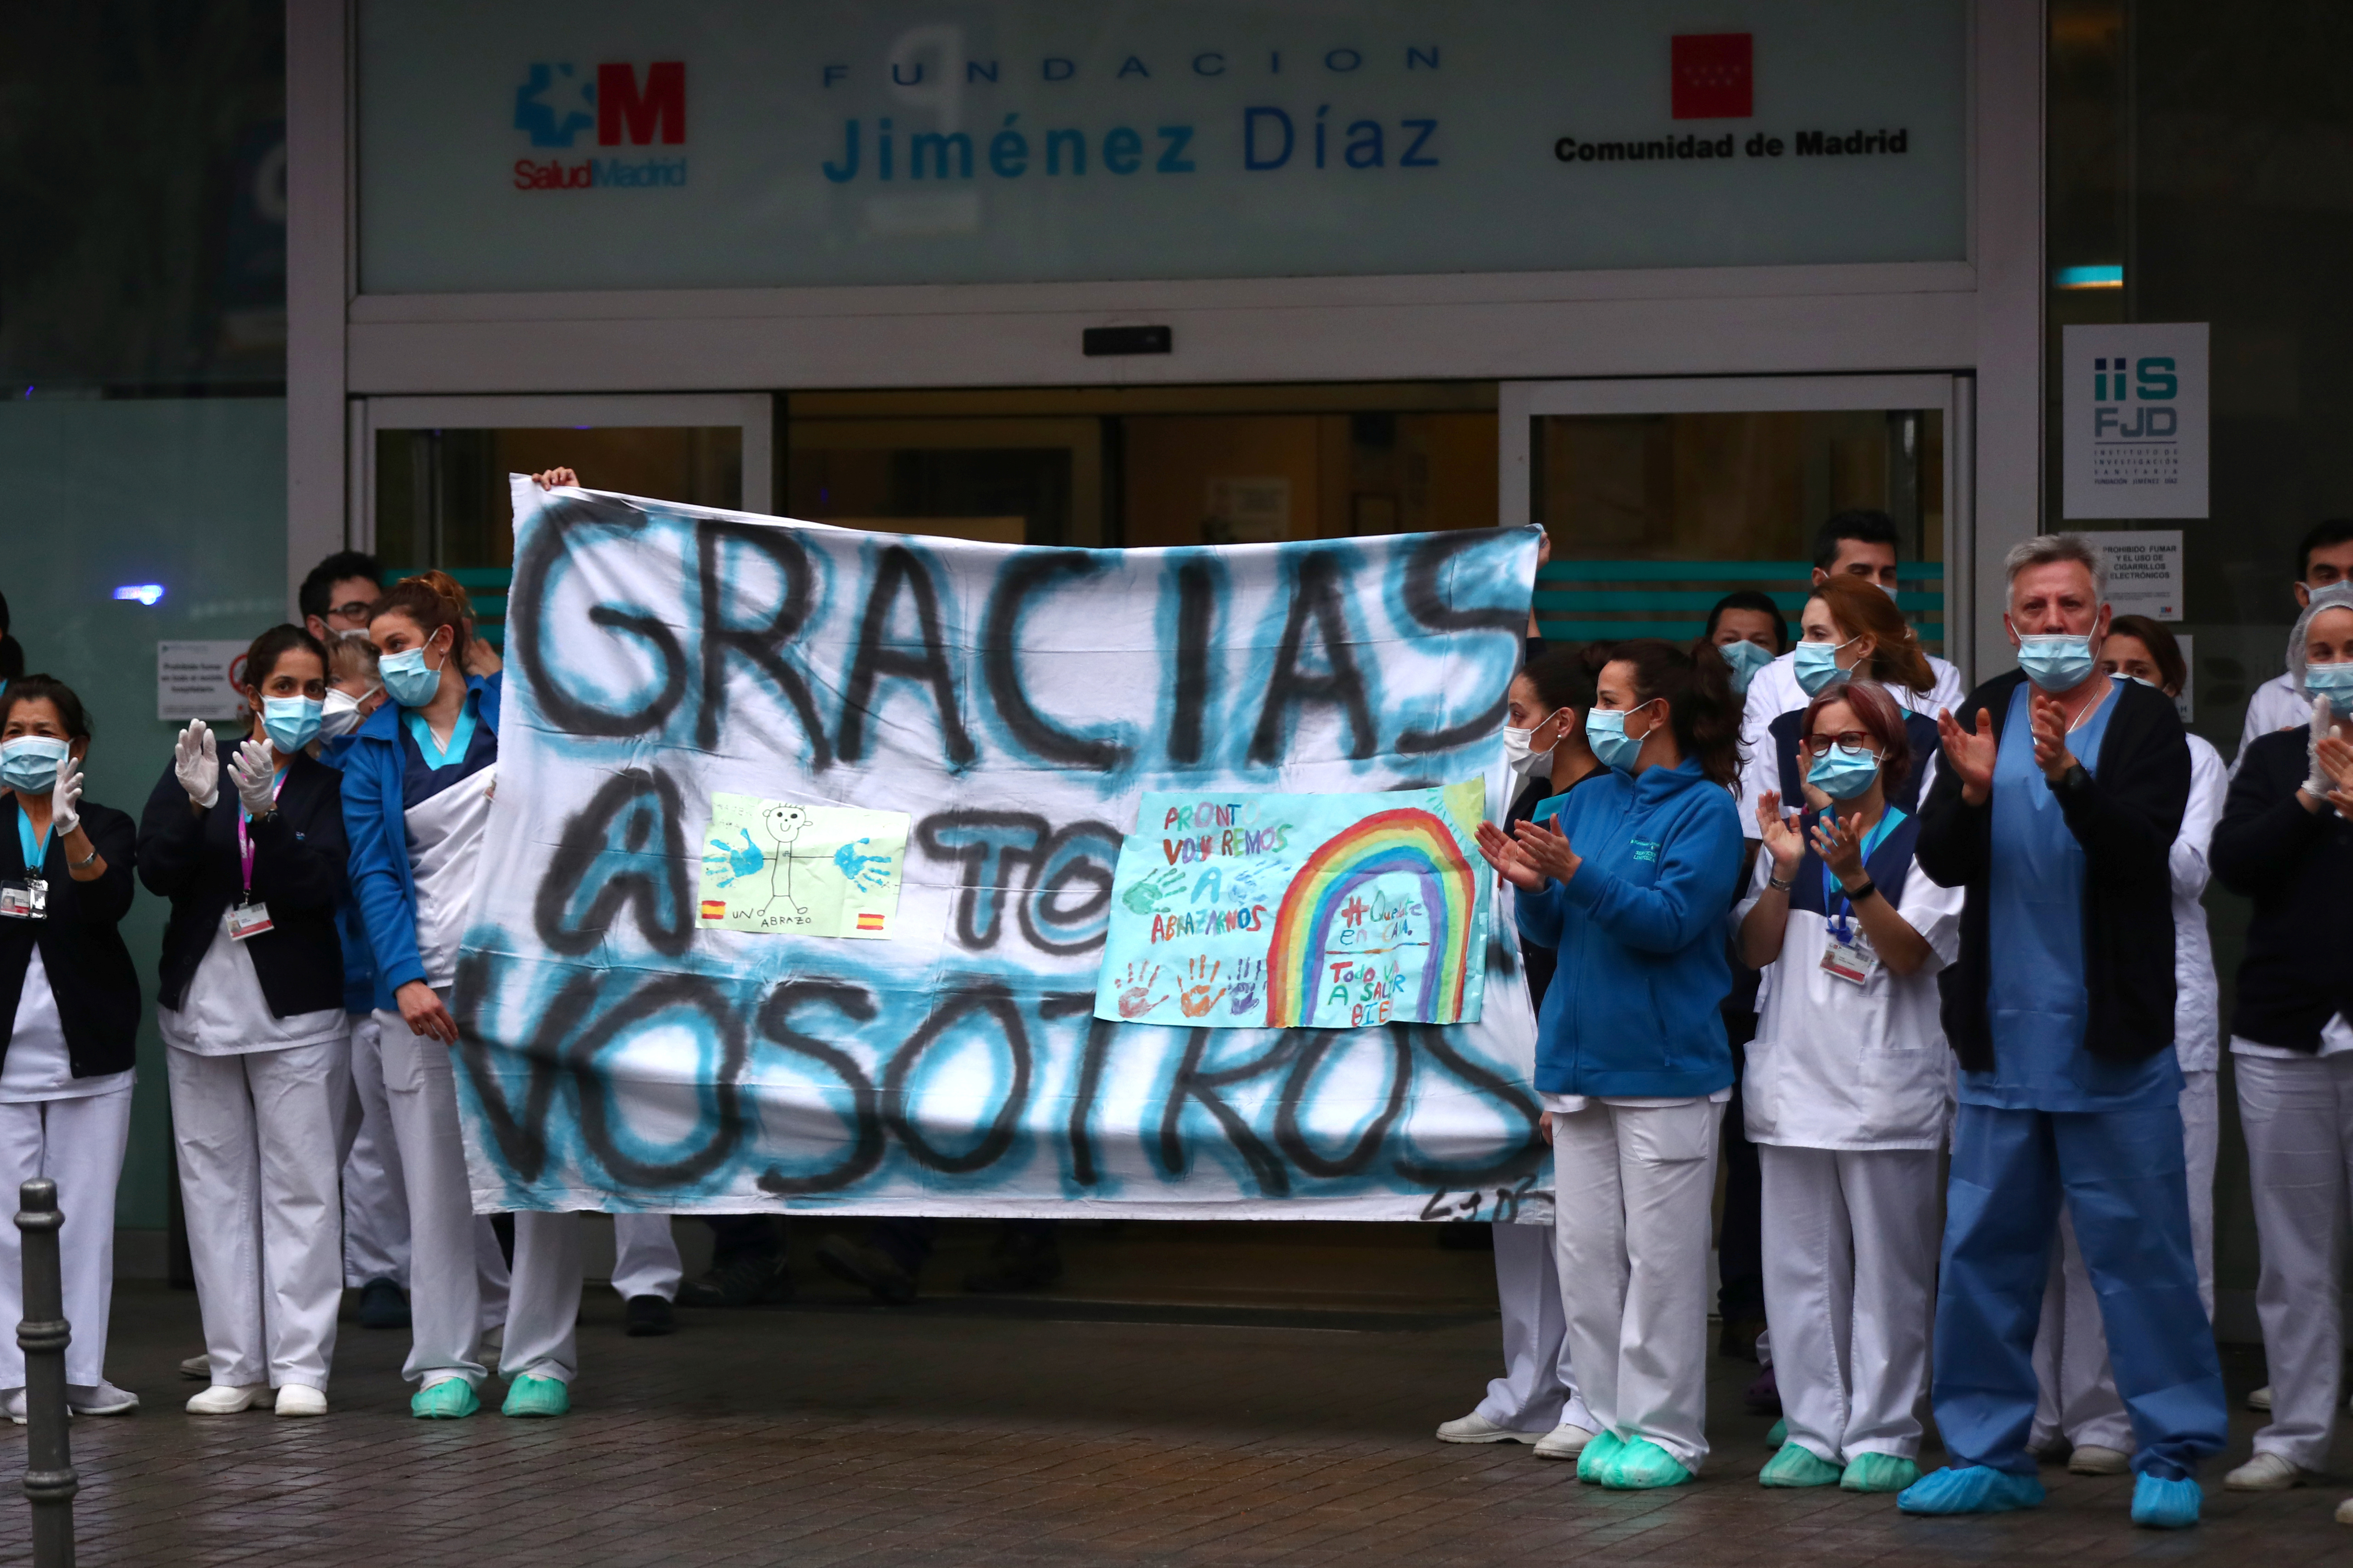 Trabajadores del hospital Fundacion Jimenez Diaz en Madrid (REUTERS/Sergio Perez)